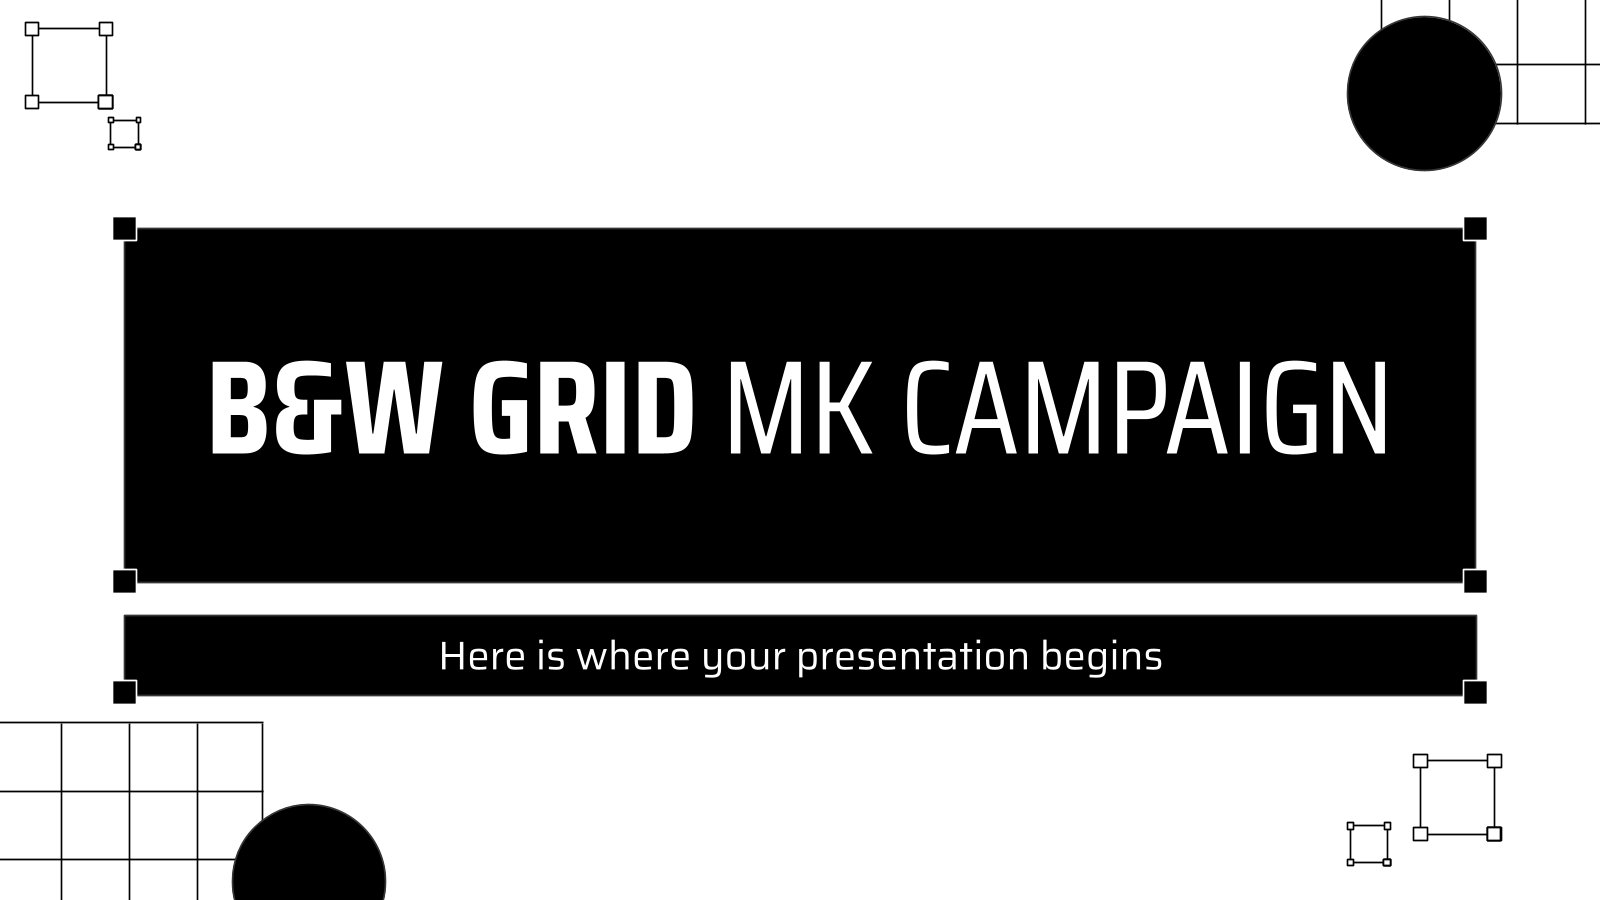 B&W Grid MK Campaign presentation template